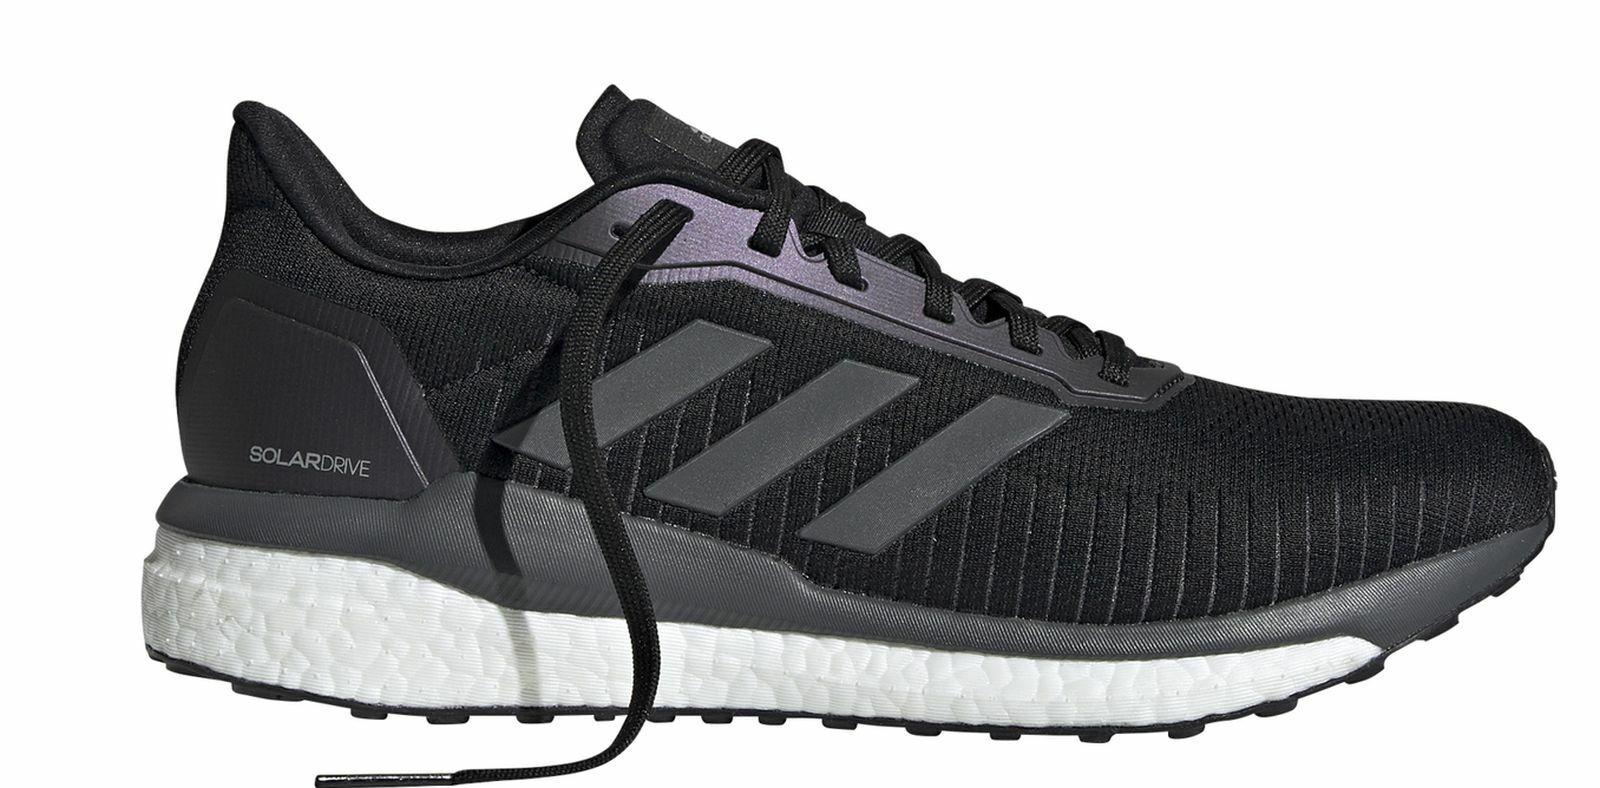 Adidas performance señores mentecato solar Drive 19 m Core negro